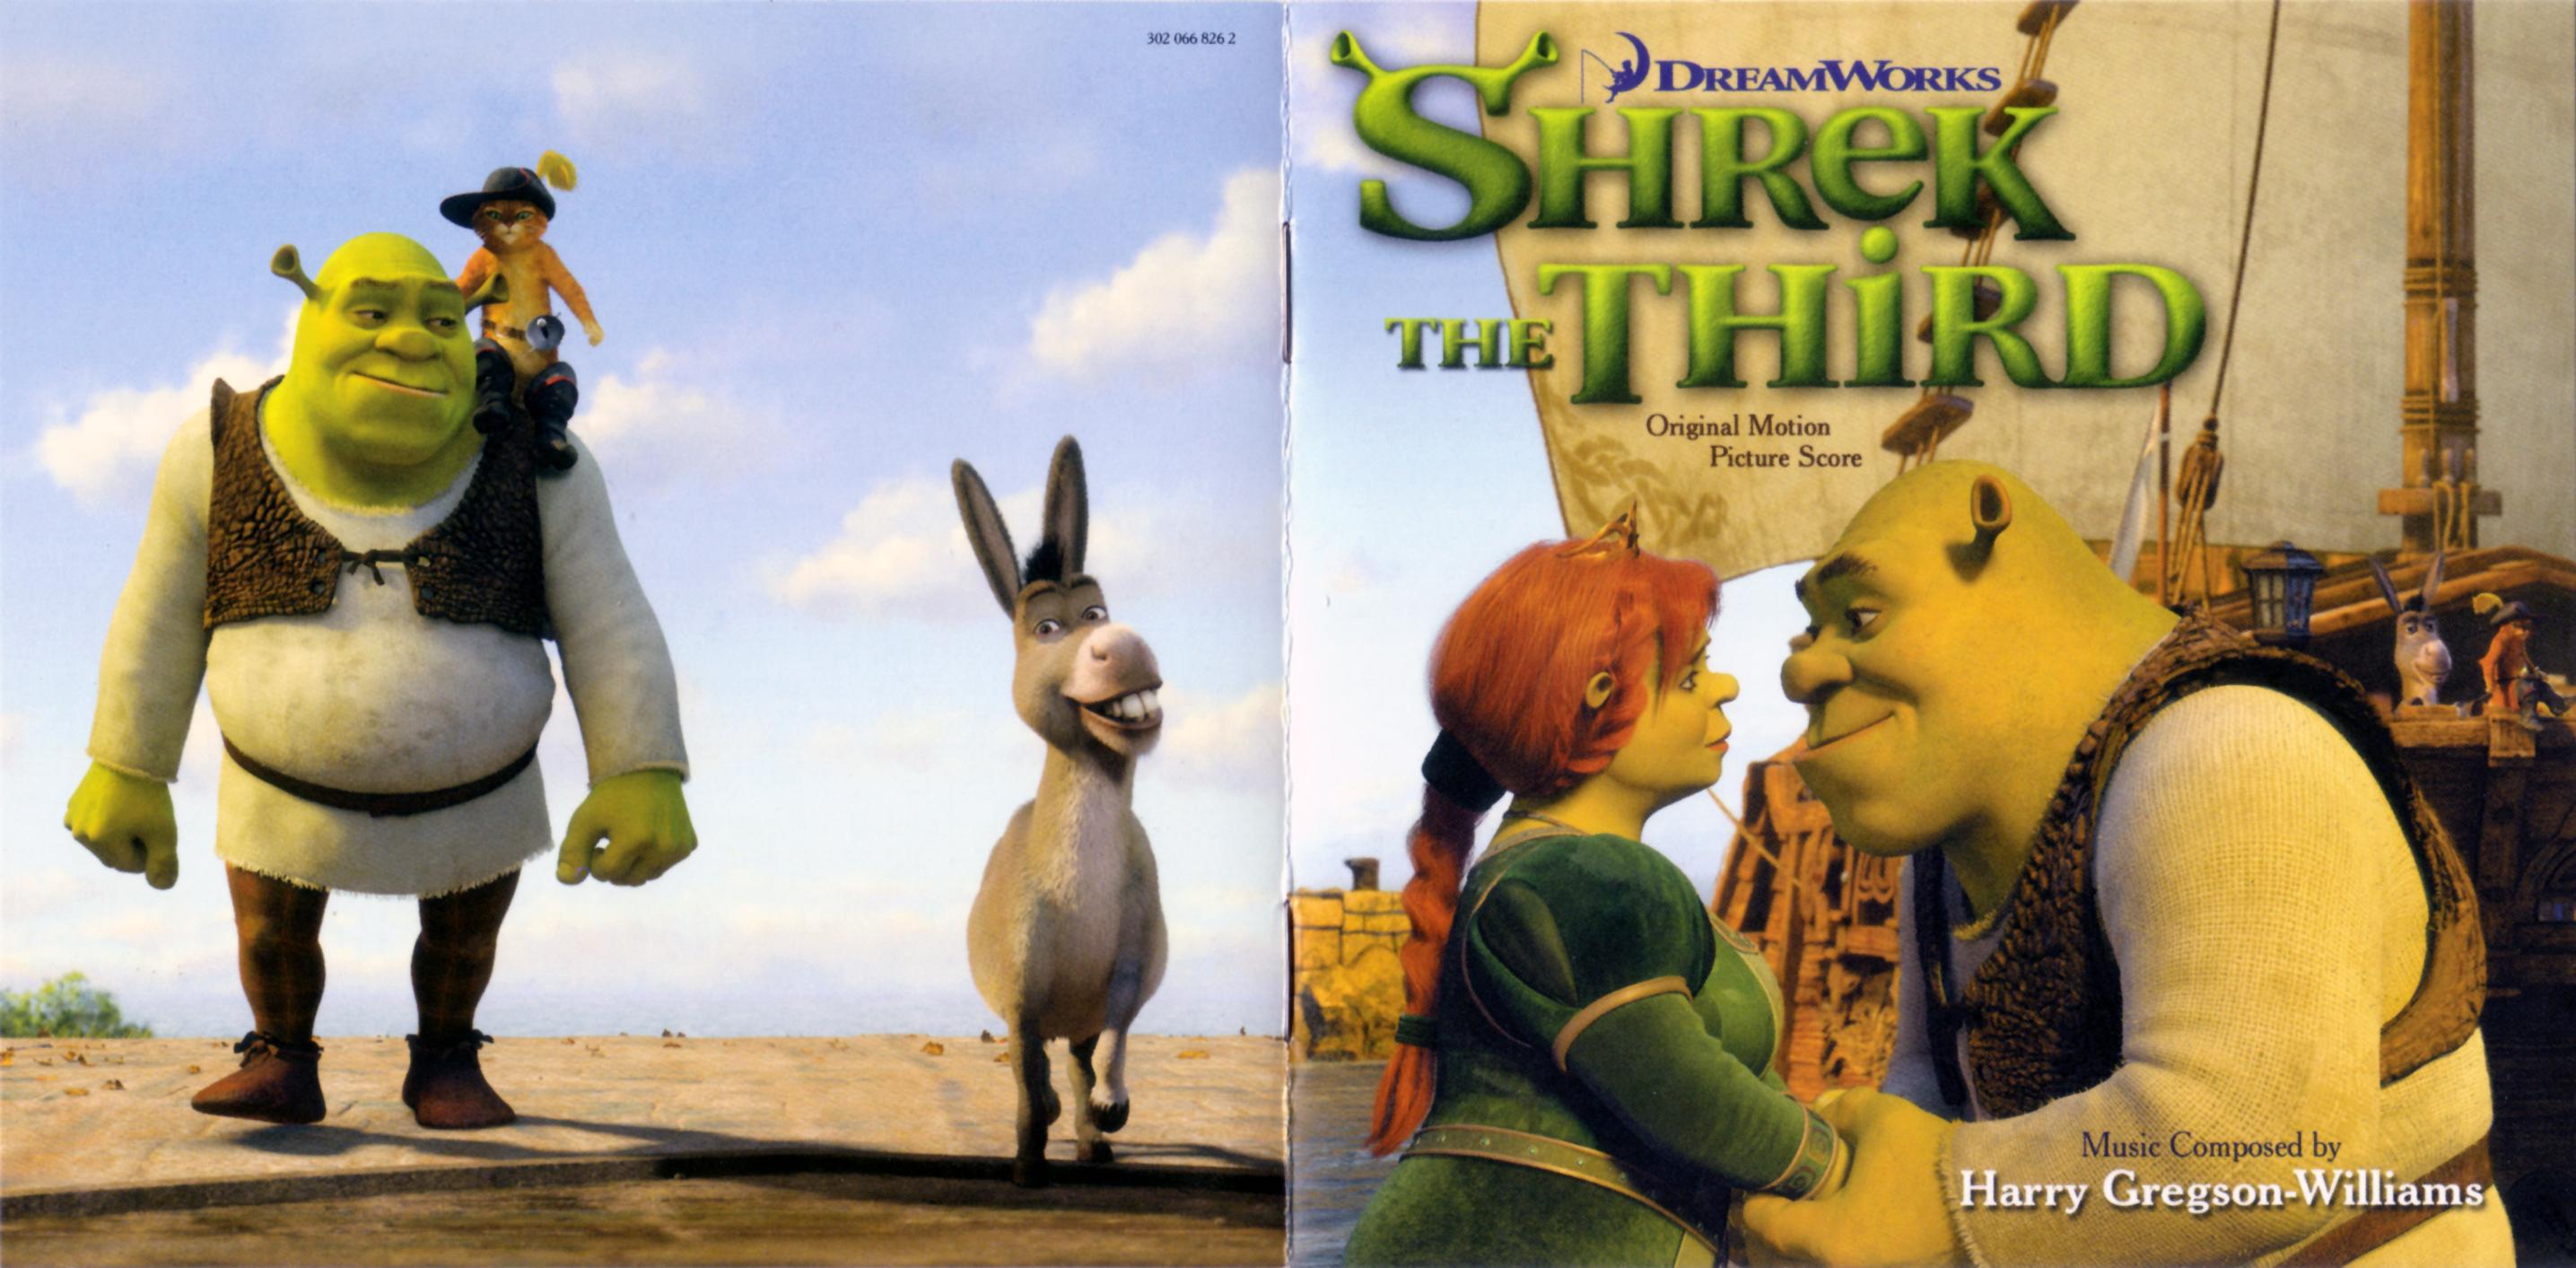 Shrek The Third Original Motion Picture Score